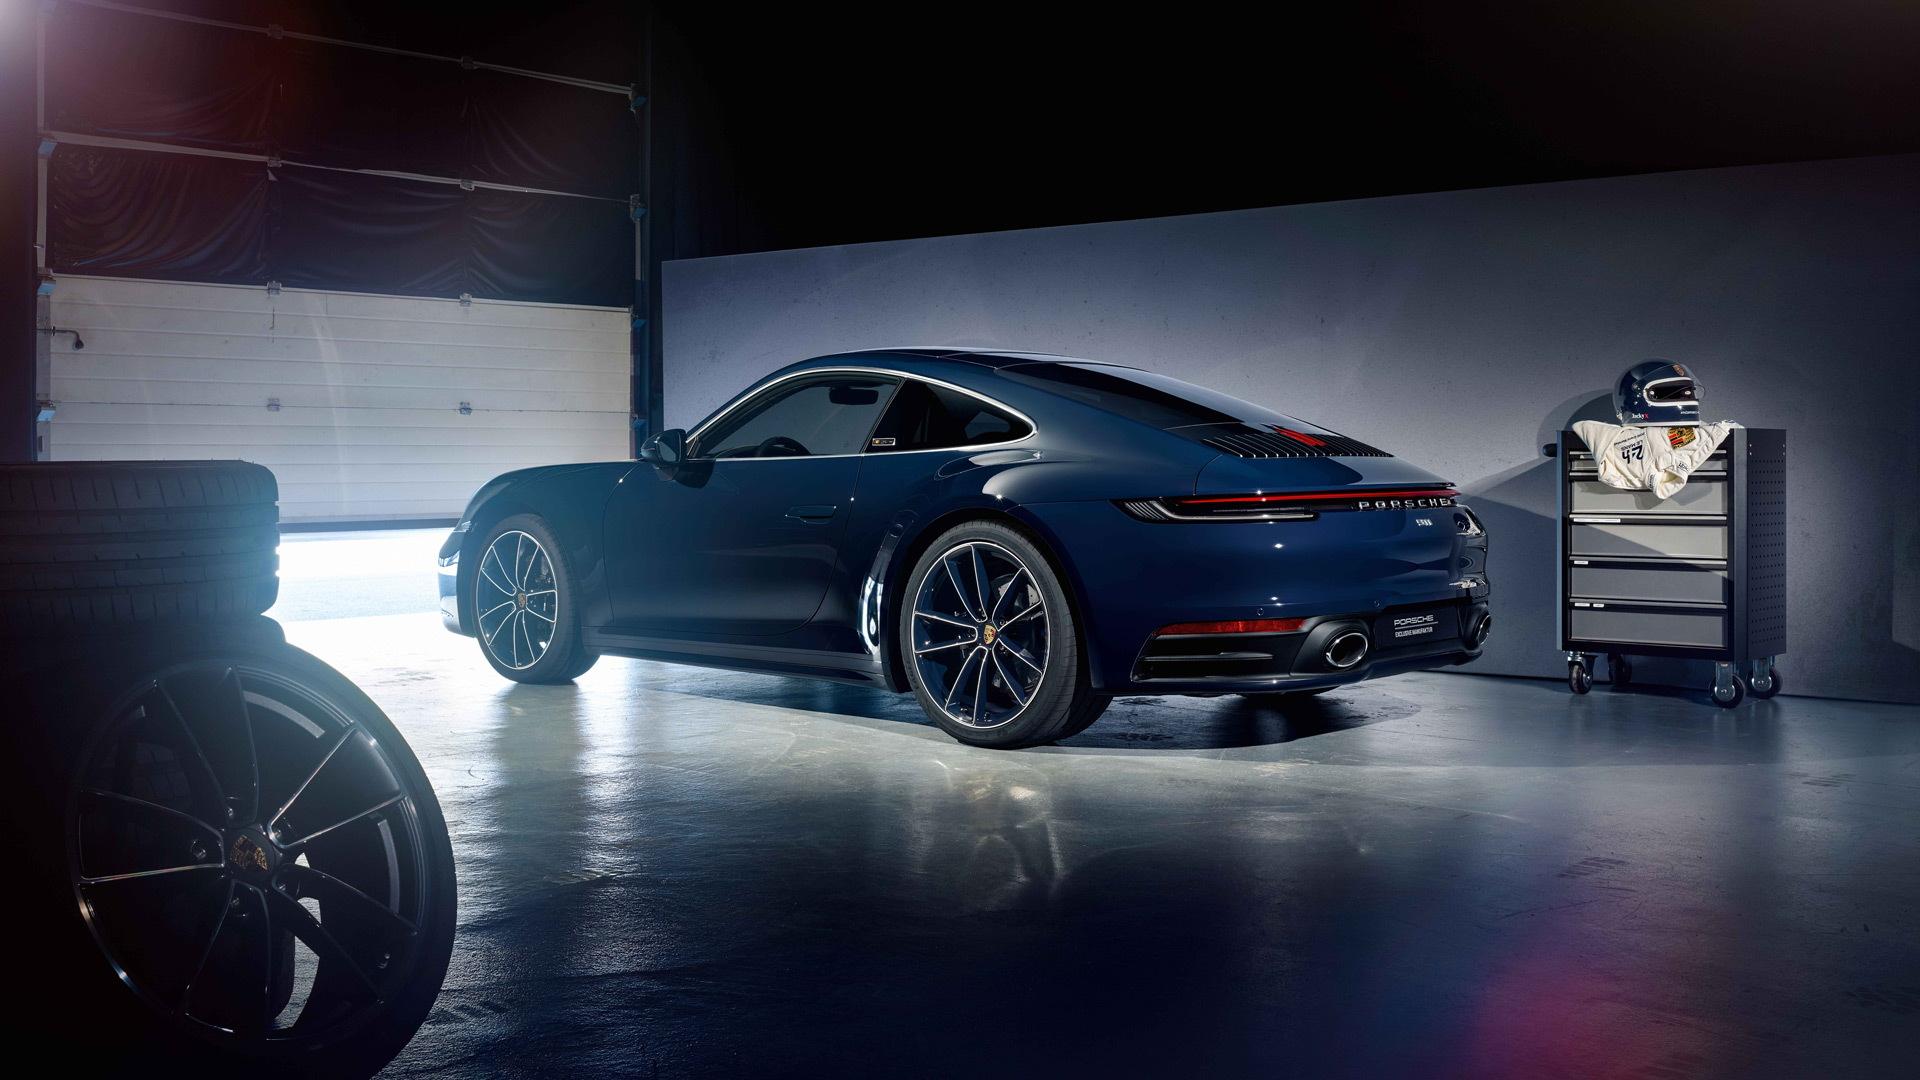 2020 Porsche 911 Carrera 4S Belgian Legend Edition